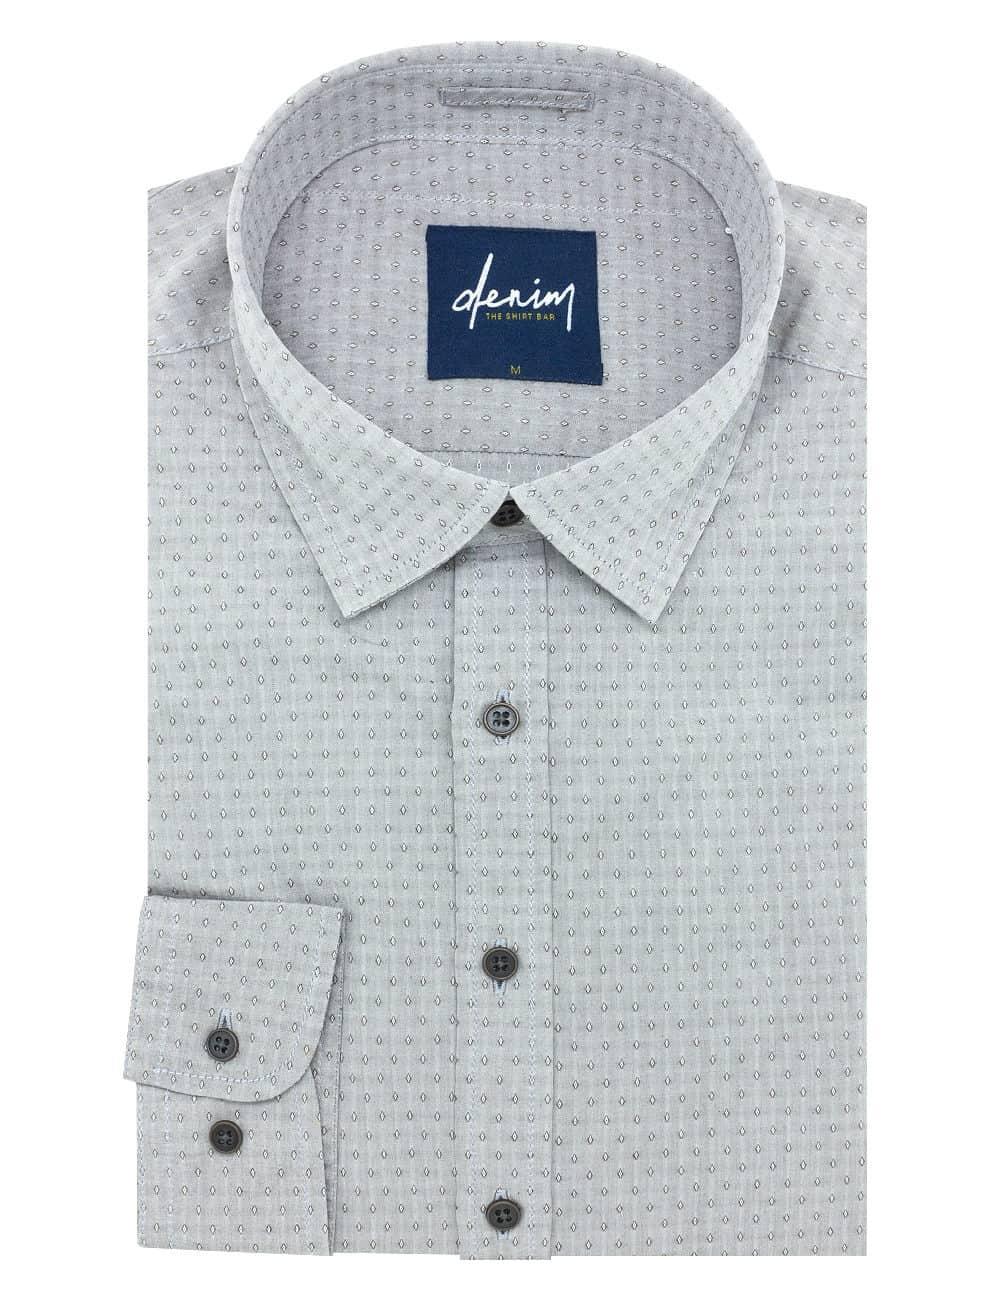 RF Brown Diamond Pattern Denim Collection 100% Cotton Long Sleeve Single Cuff Shirt RF27B6.5